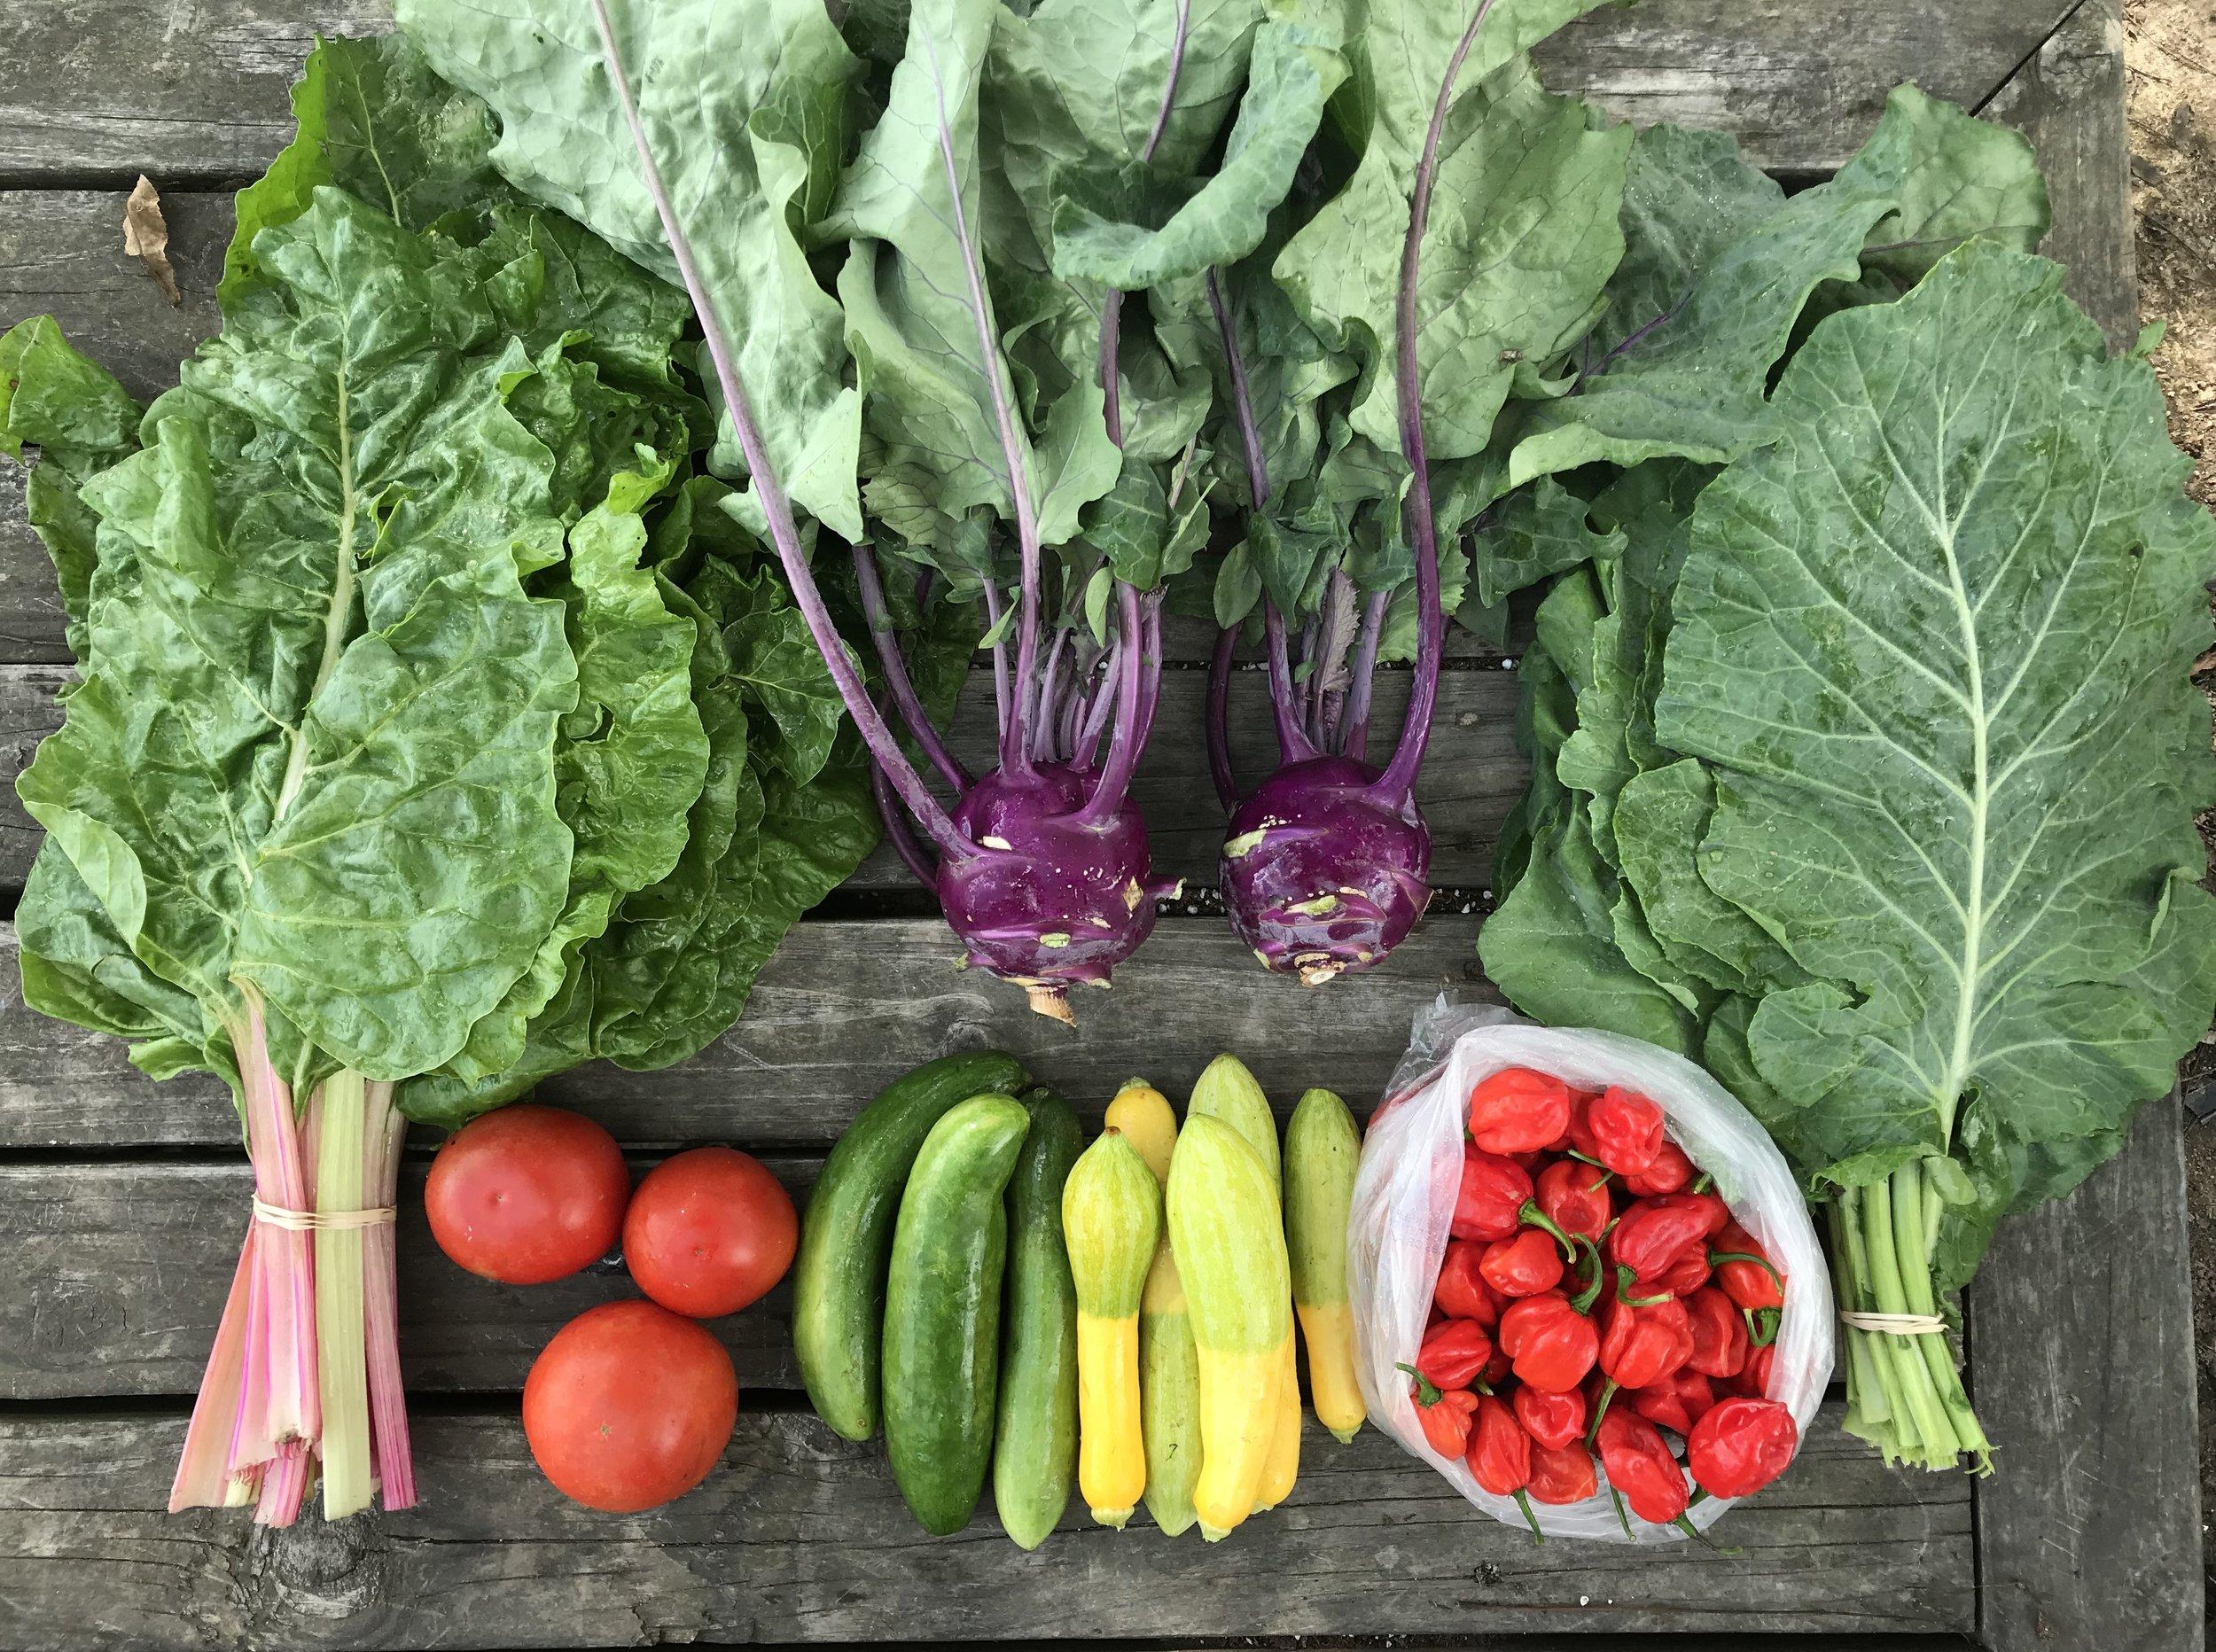 Top Row: Swiss Chard, 2 Kohlrabi, and Collard Greens  Bottom Row: Tomatoes, Cucumbers, Squash, and Aji Dulce Peppers